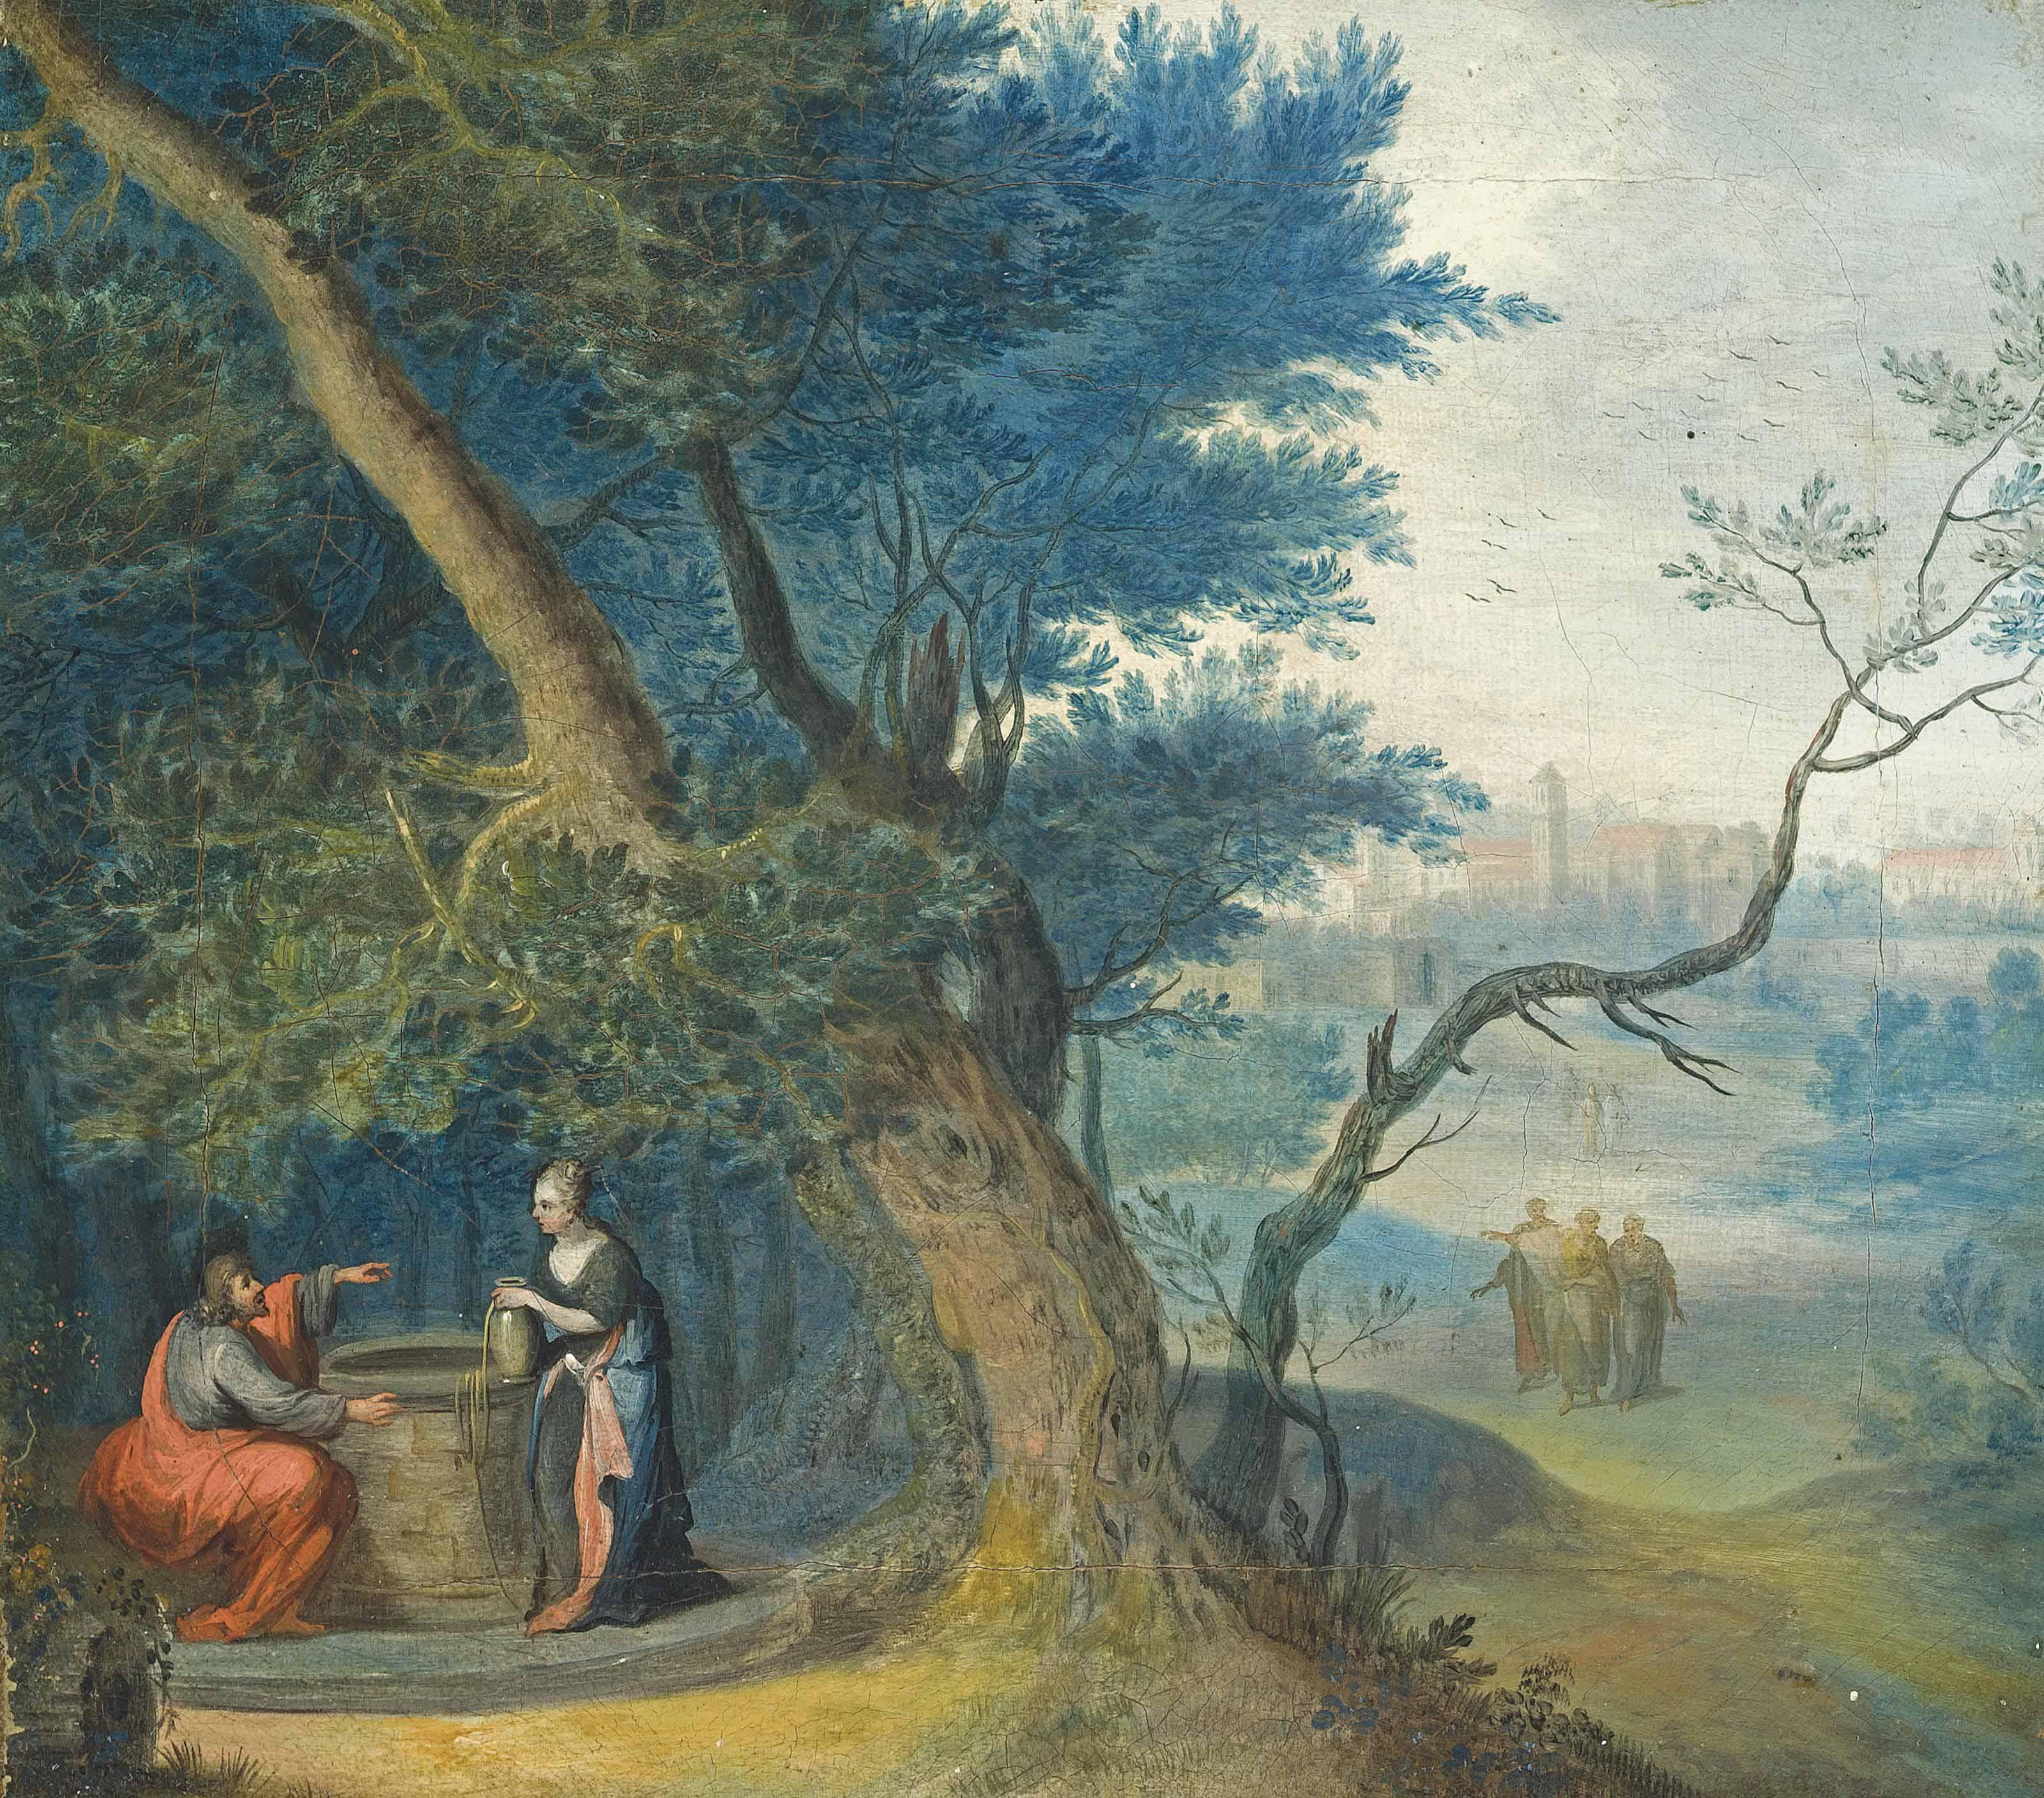 The Samaritan woman at the well